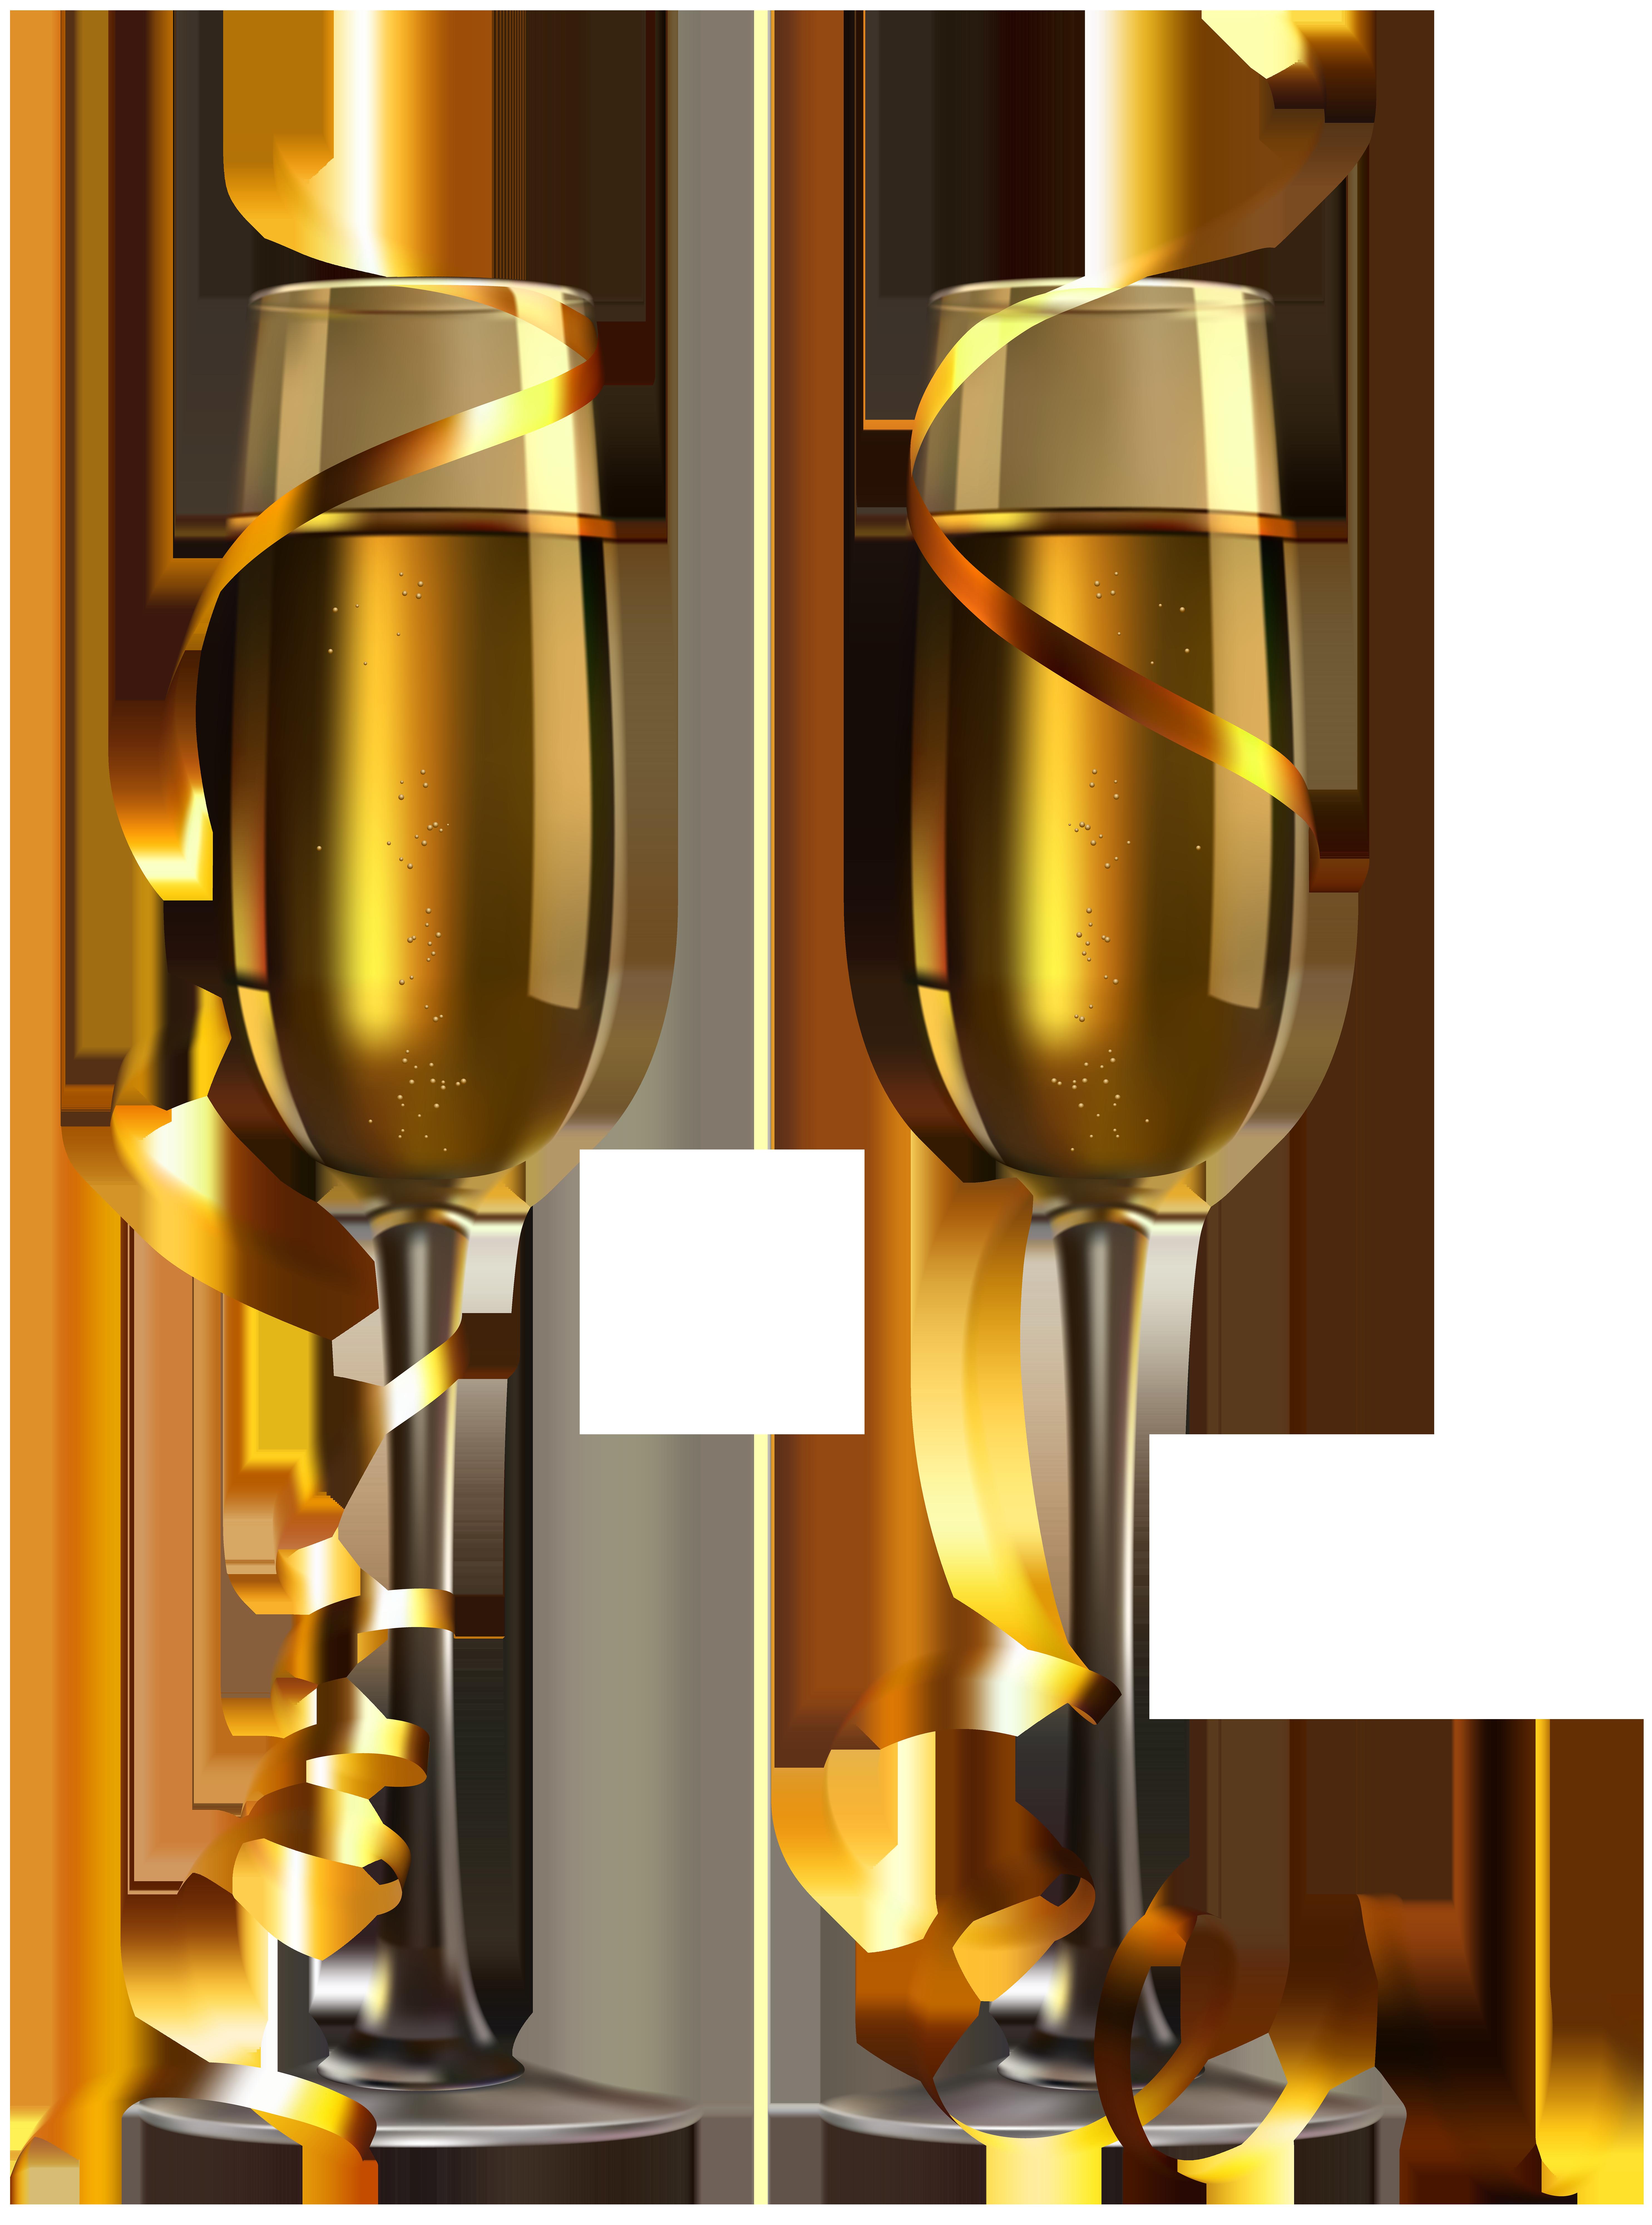 Glass Champagne Glasses Wine Free Clipart Hd Champagne Glasses Image Glass Clip Art